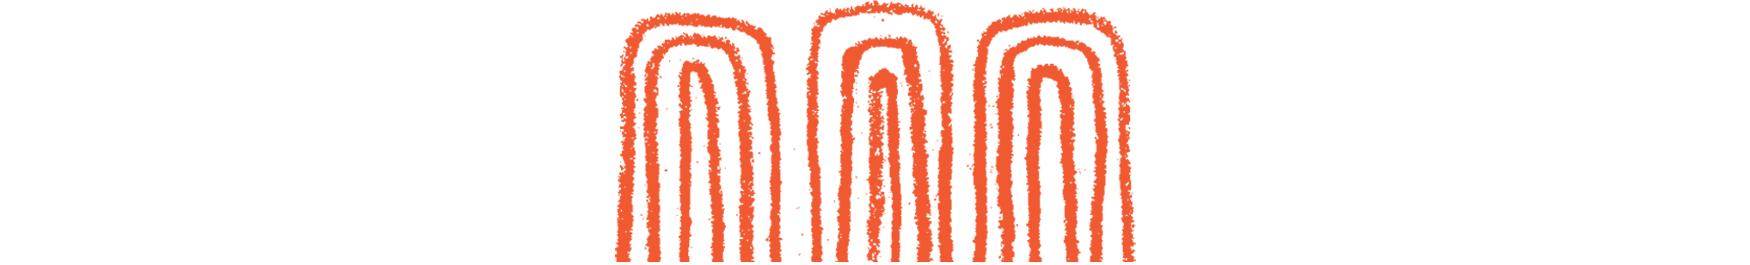 products-orange.jpg